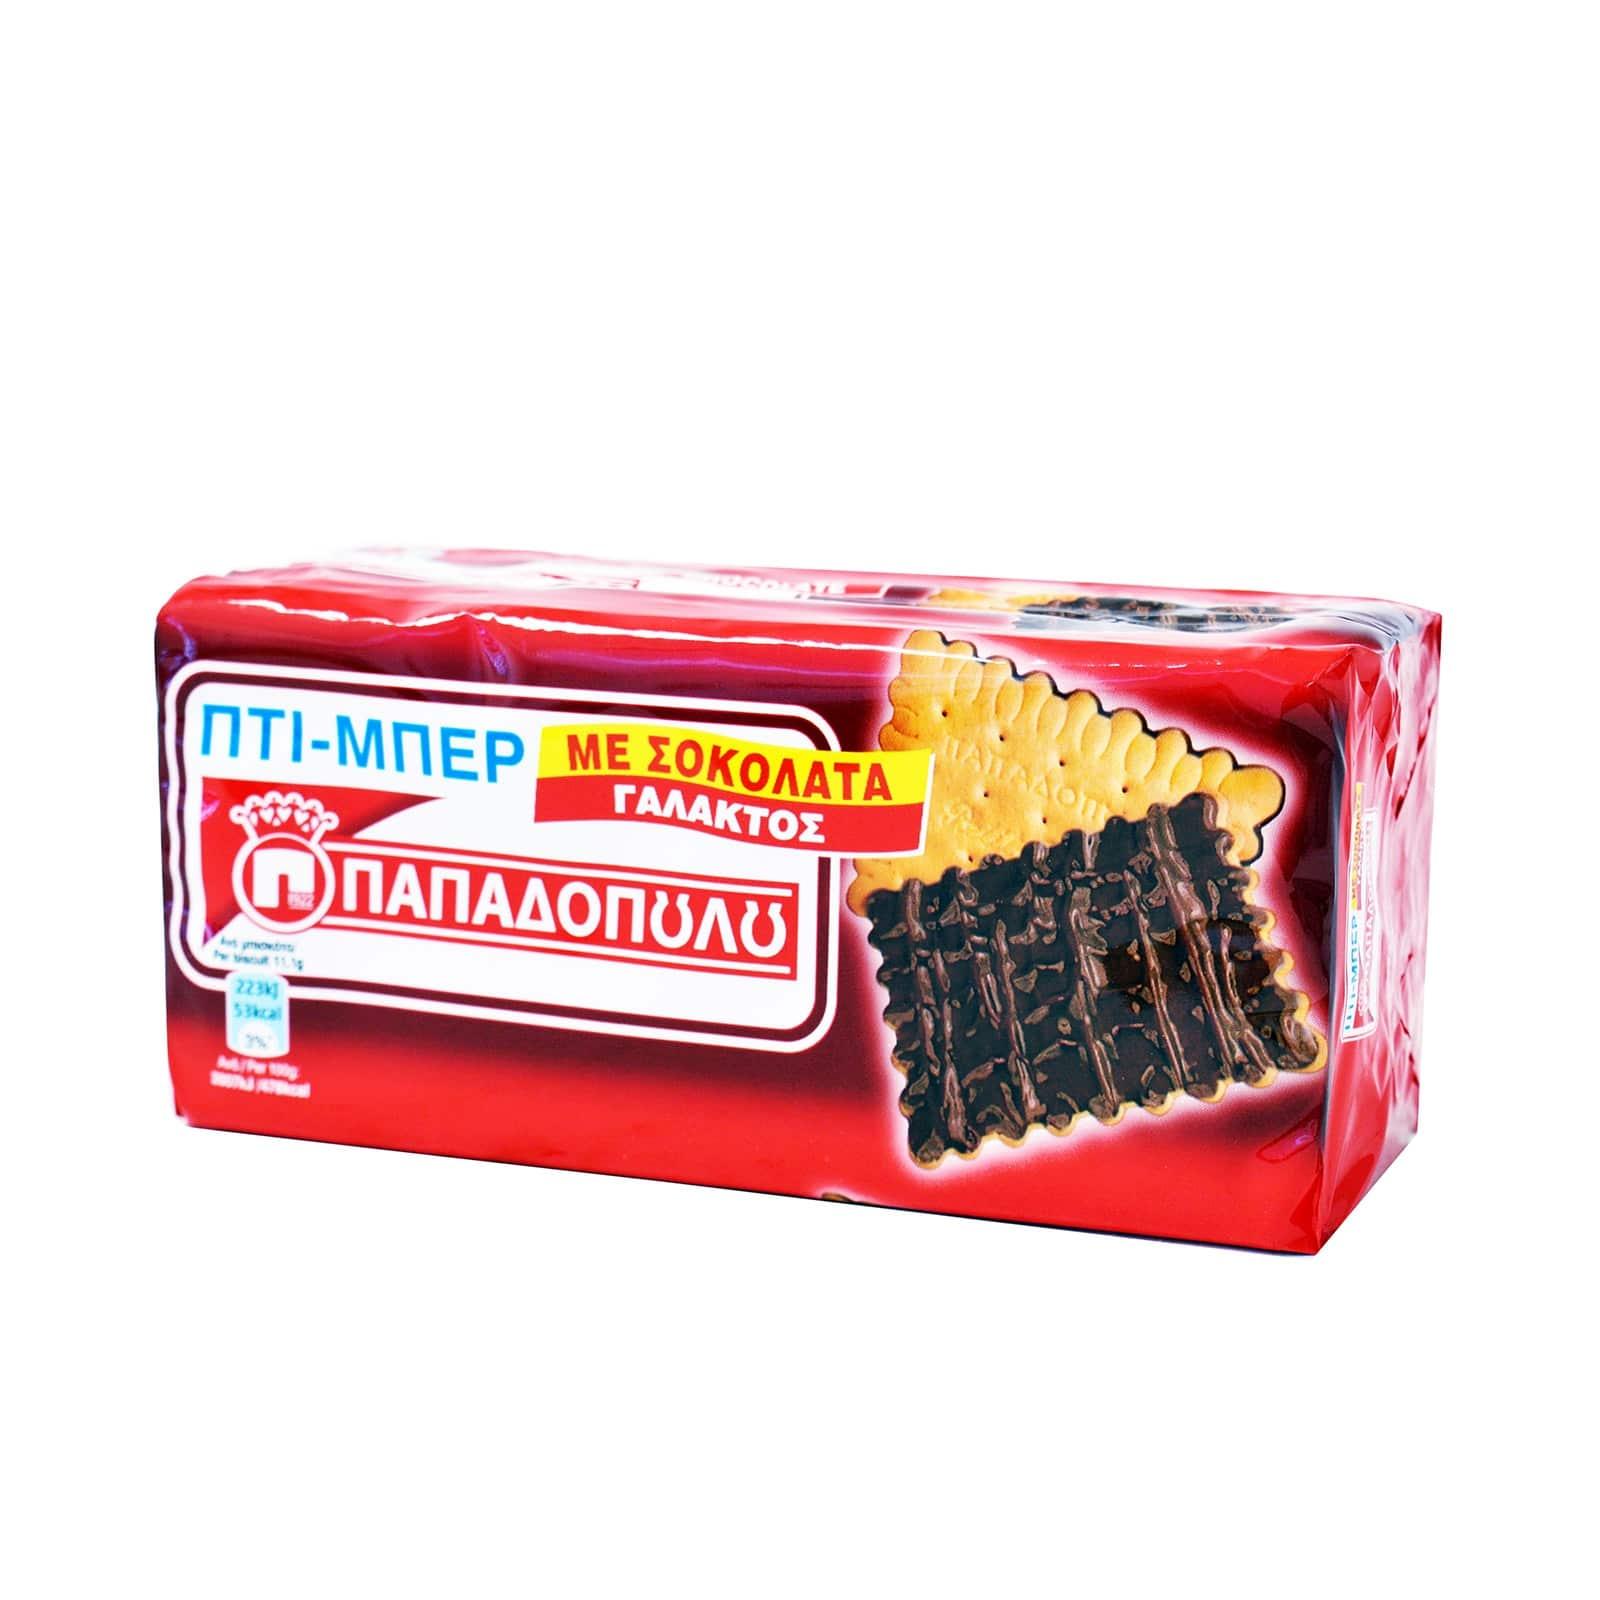 62fd7c71536 Papadopoulou Petit-Beurre Chocolate Biscuits / Πτι μπερ Μπισκότα με Σοκολάτα  Γάλακτος 200g